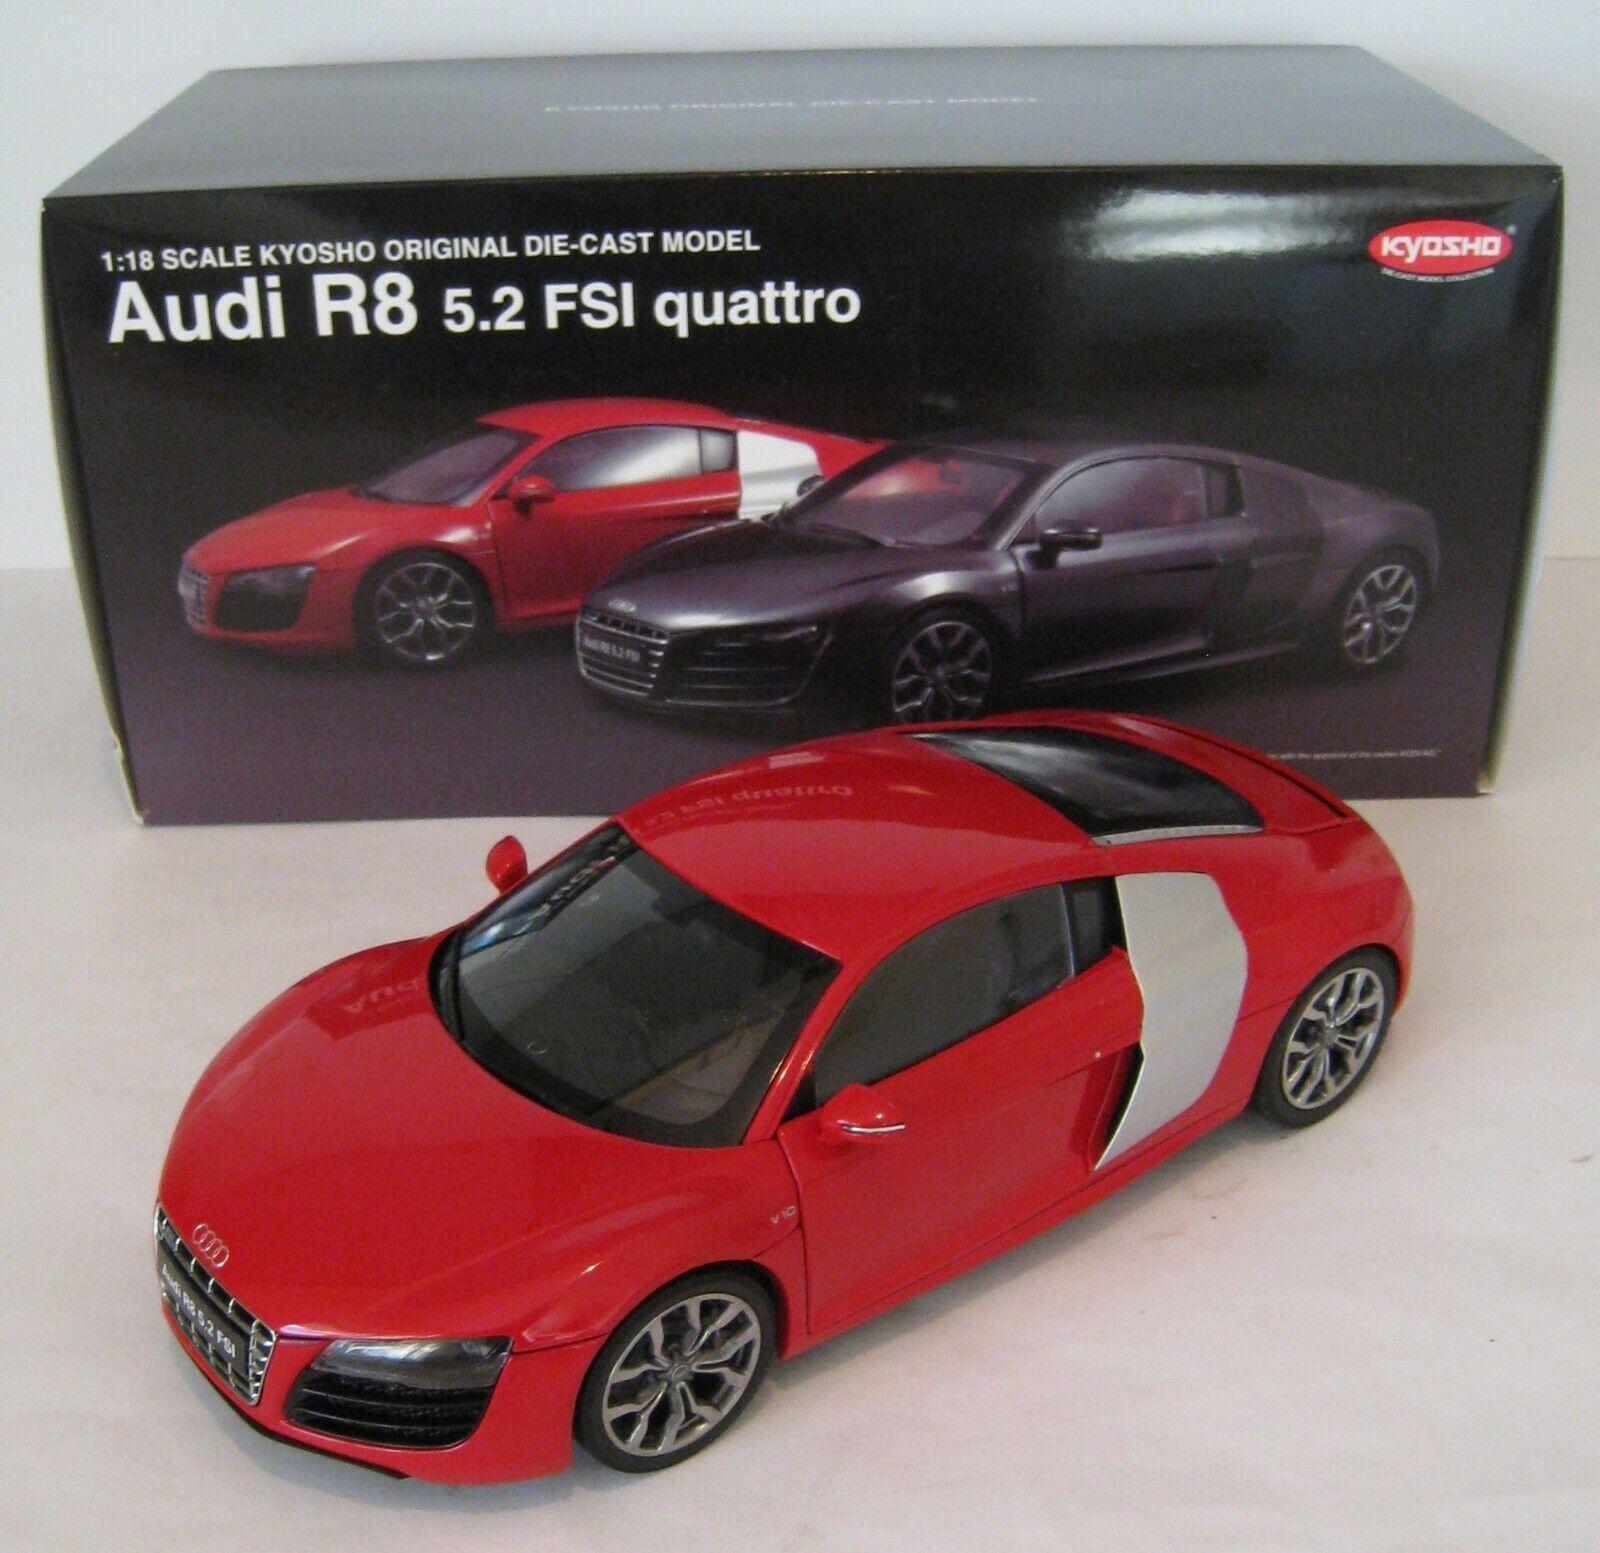 Audi R8 5.2 FSI quattro in Brilliant Red  Kyosho  Maßstab 1 18  OVP  NEU